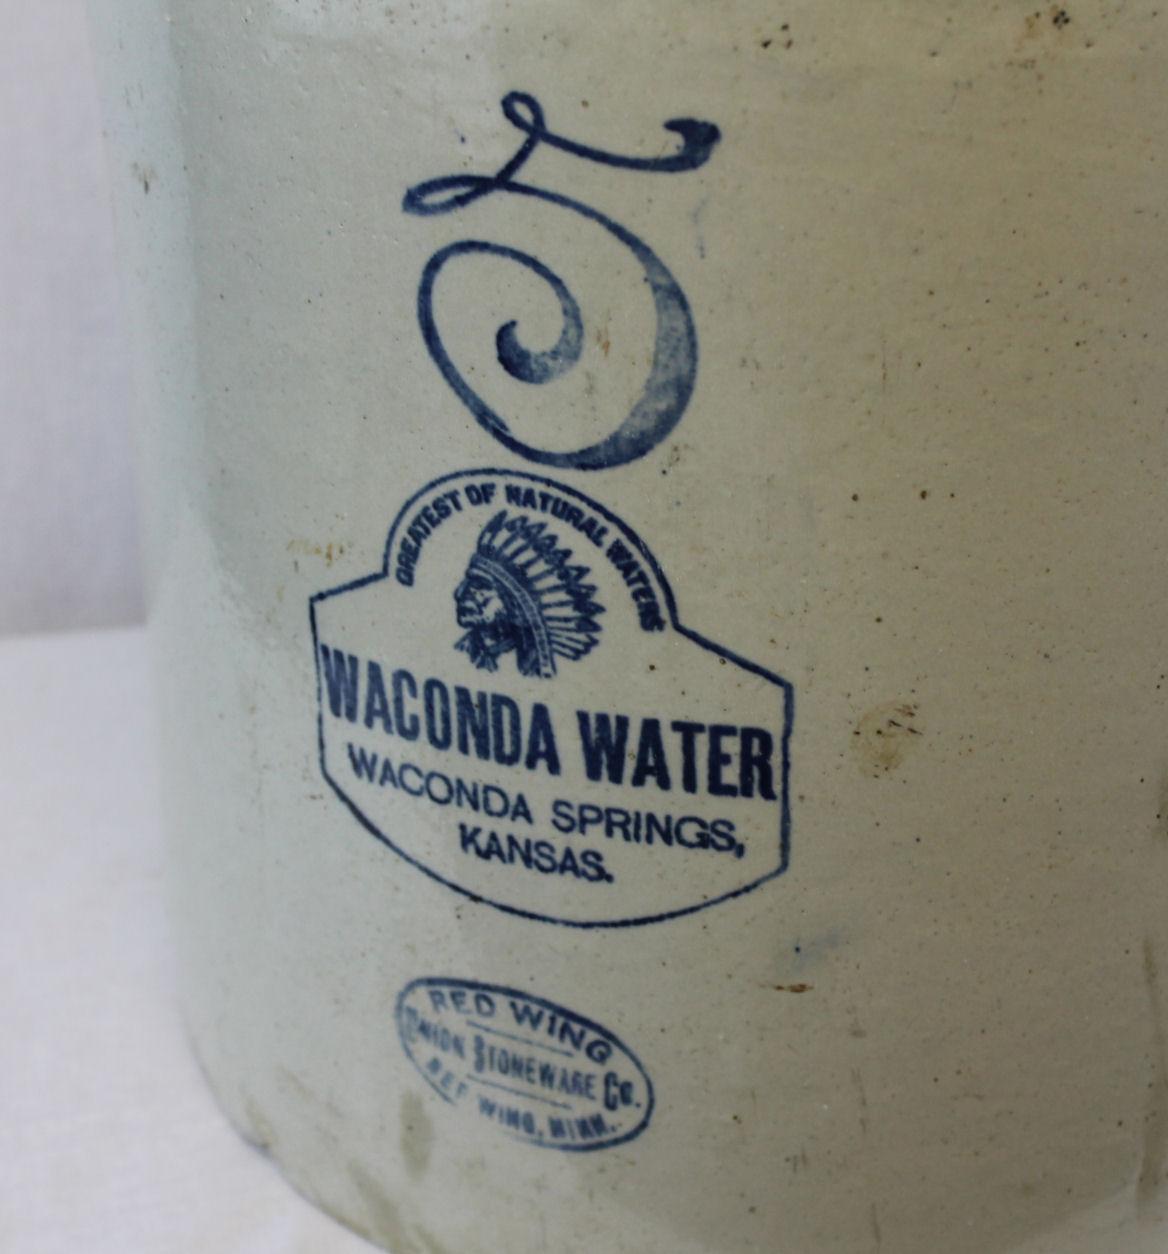 Bargain Johns Antiques  Red Wing Jug 5 gallon Waconda